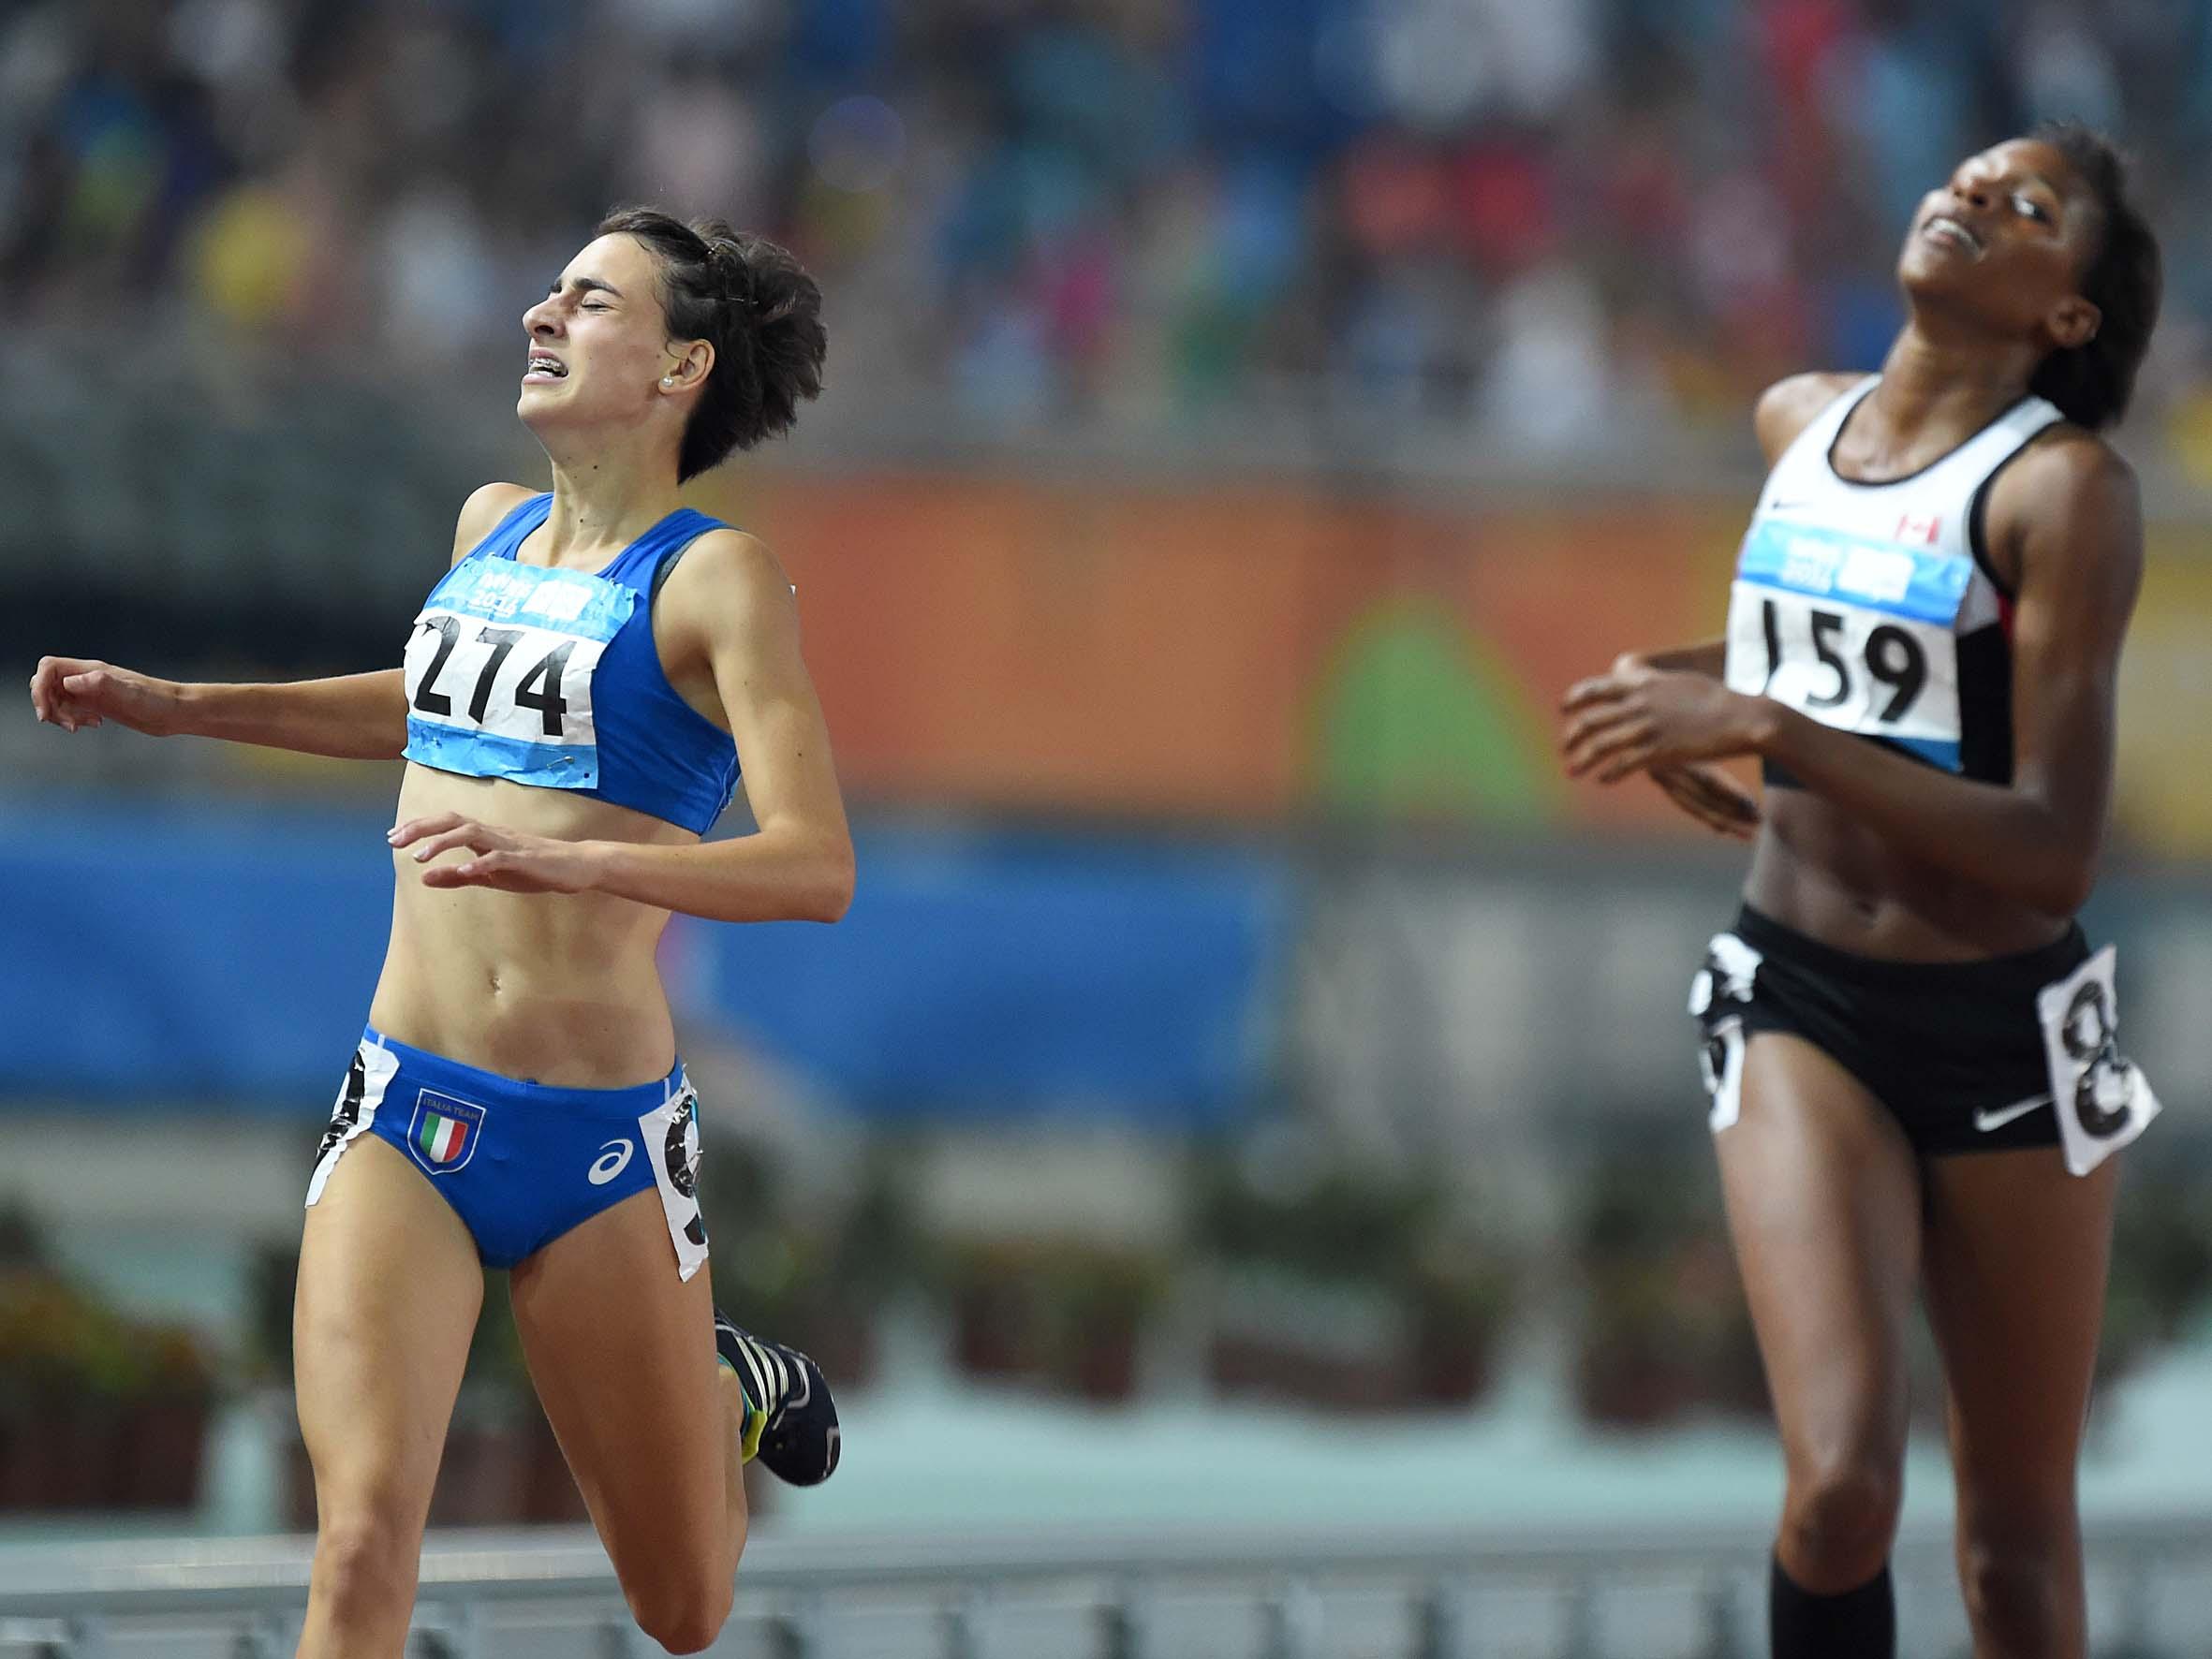 Atletica donne 400 metri 04